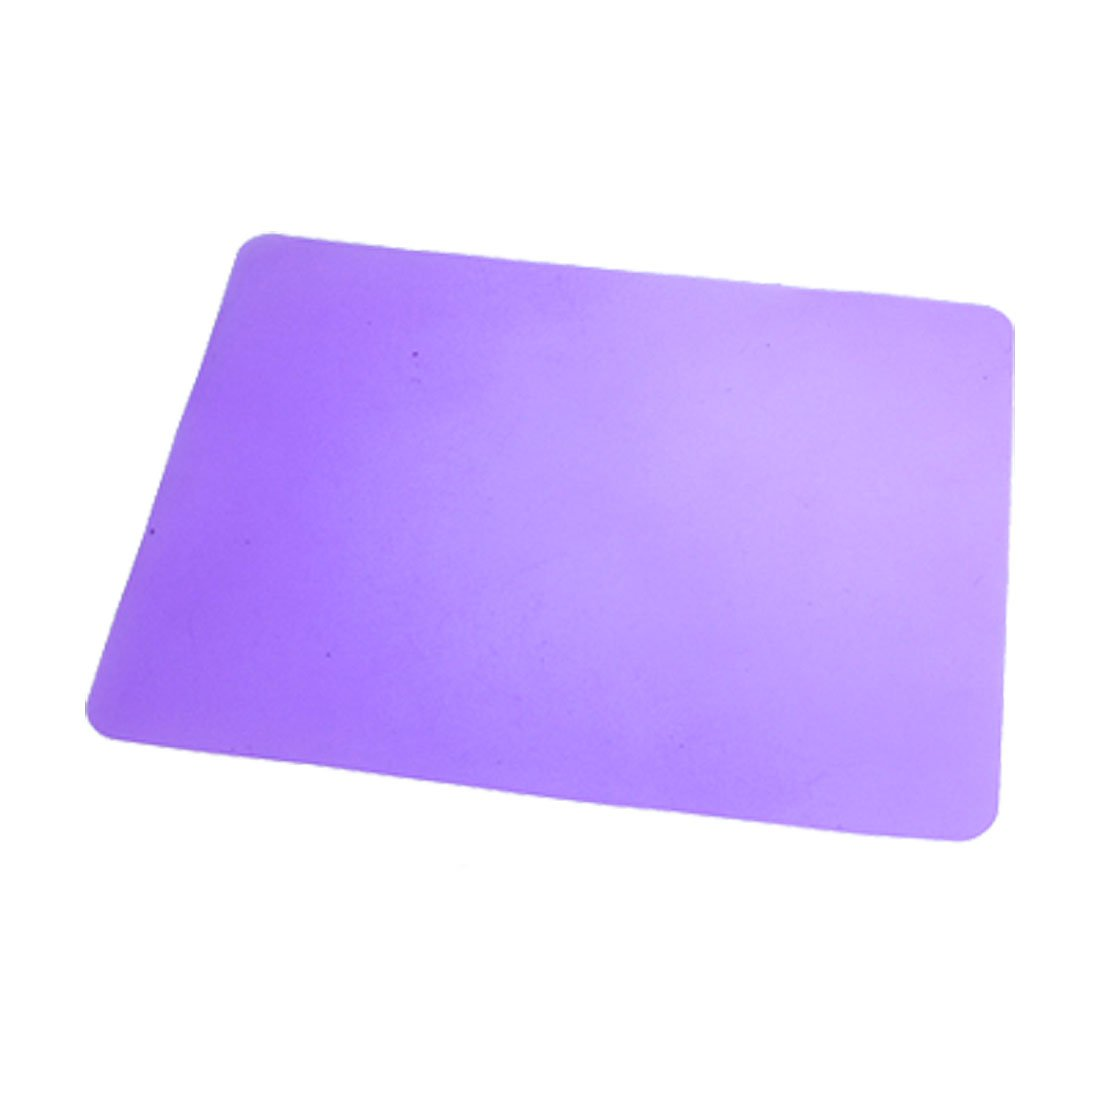 CAA Sıcak Dikdörtgen Silikon Kaymaz Mor Mouse Pad Mat Dizüstü